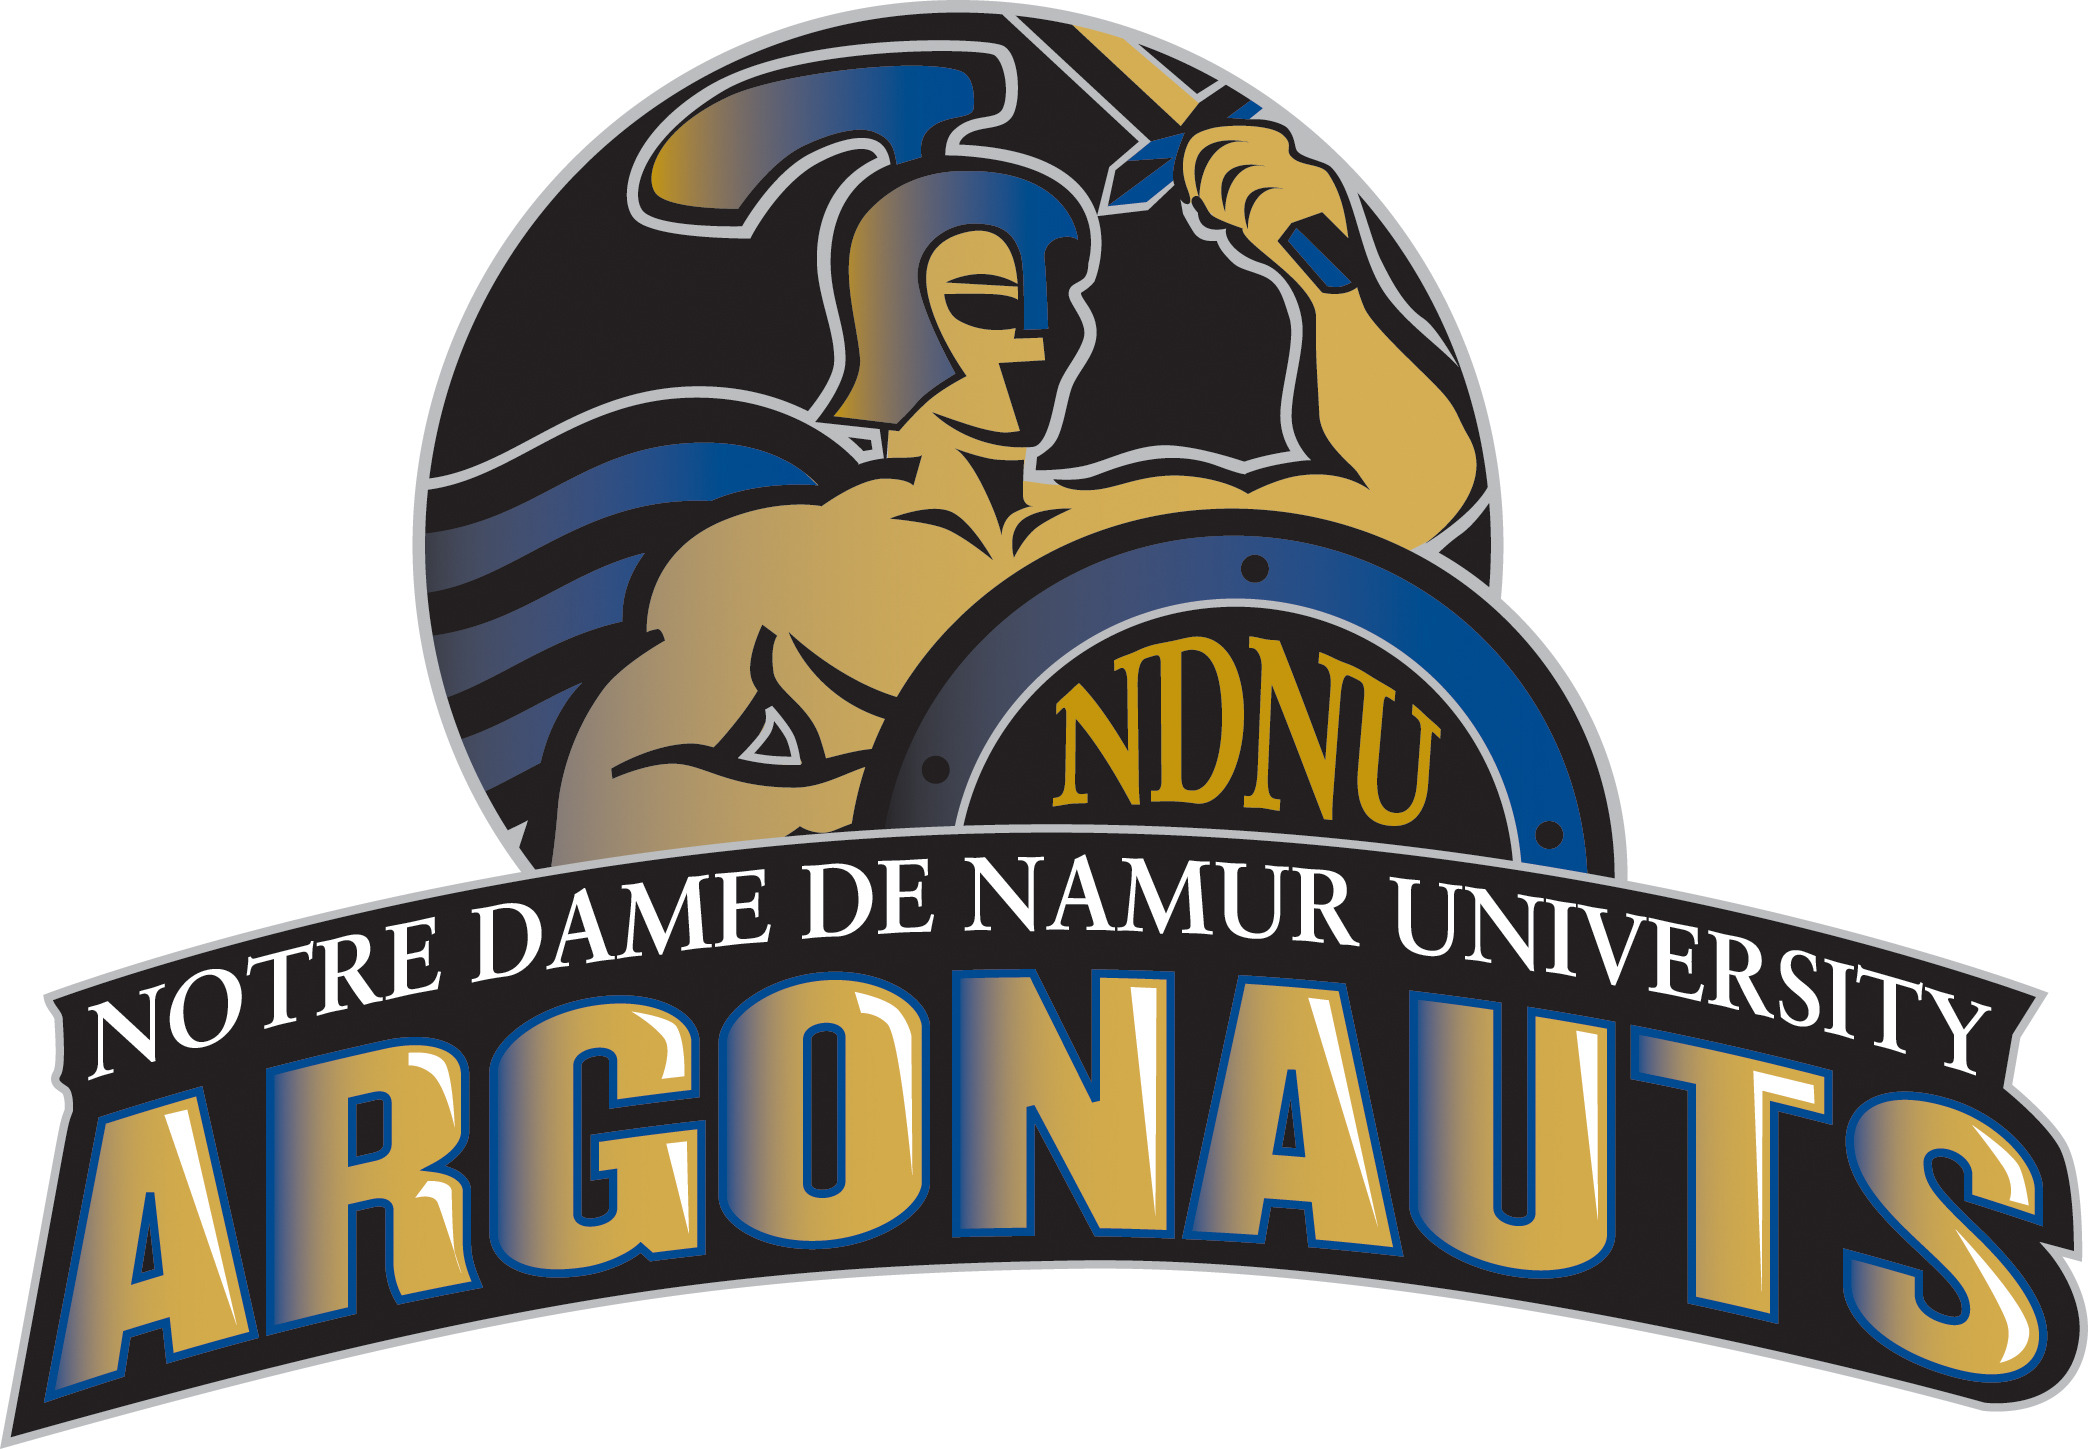 "Notre Dame de Namur (DII) (<a href=""/area-of-your-site"">→</a><strong>Paul McCallion</strong>"